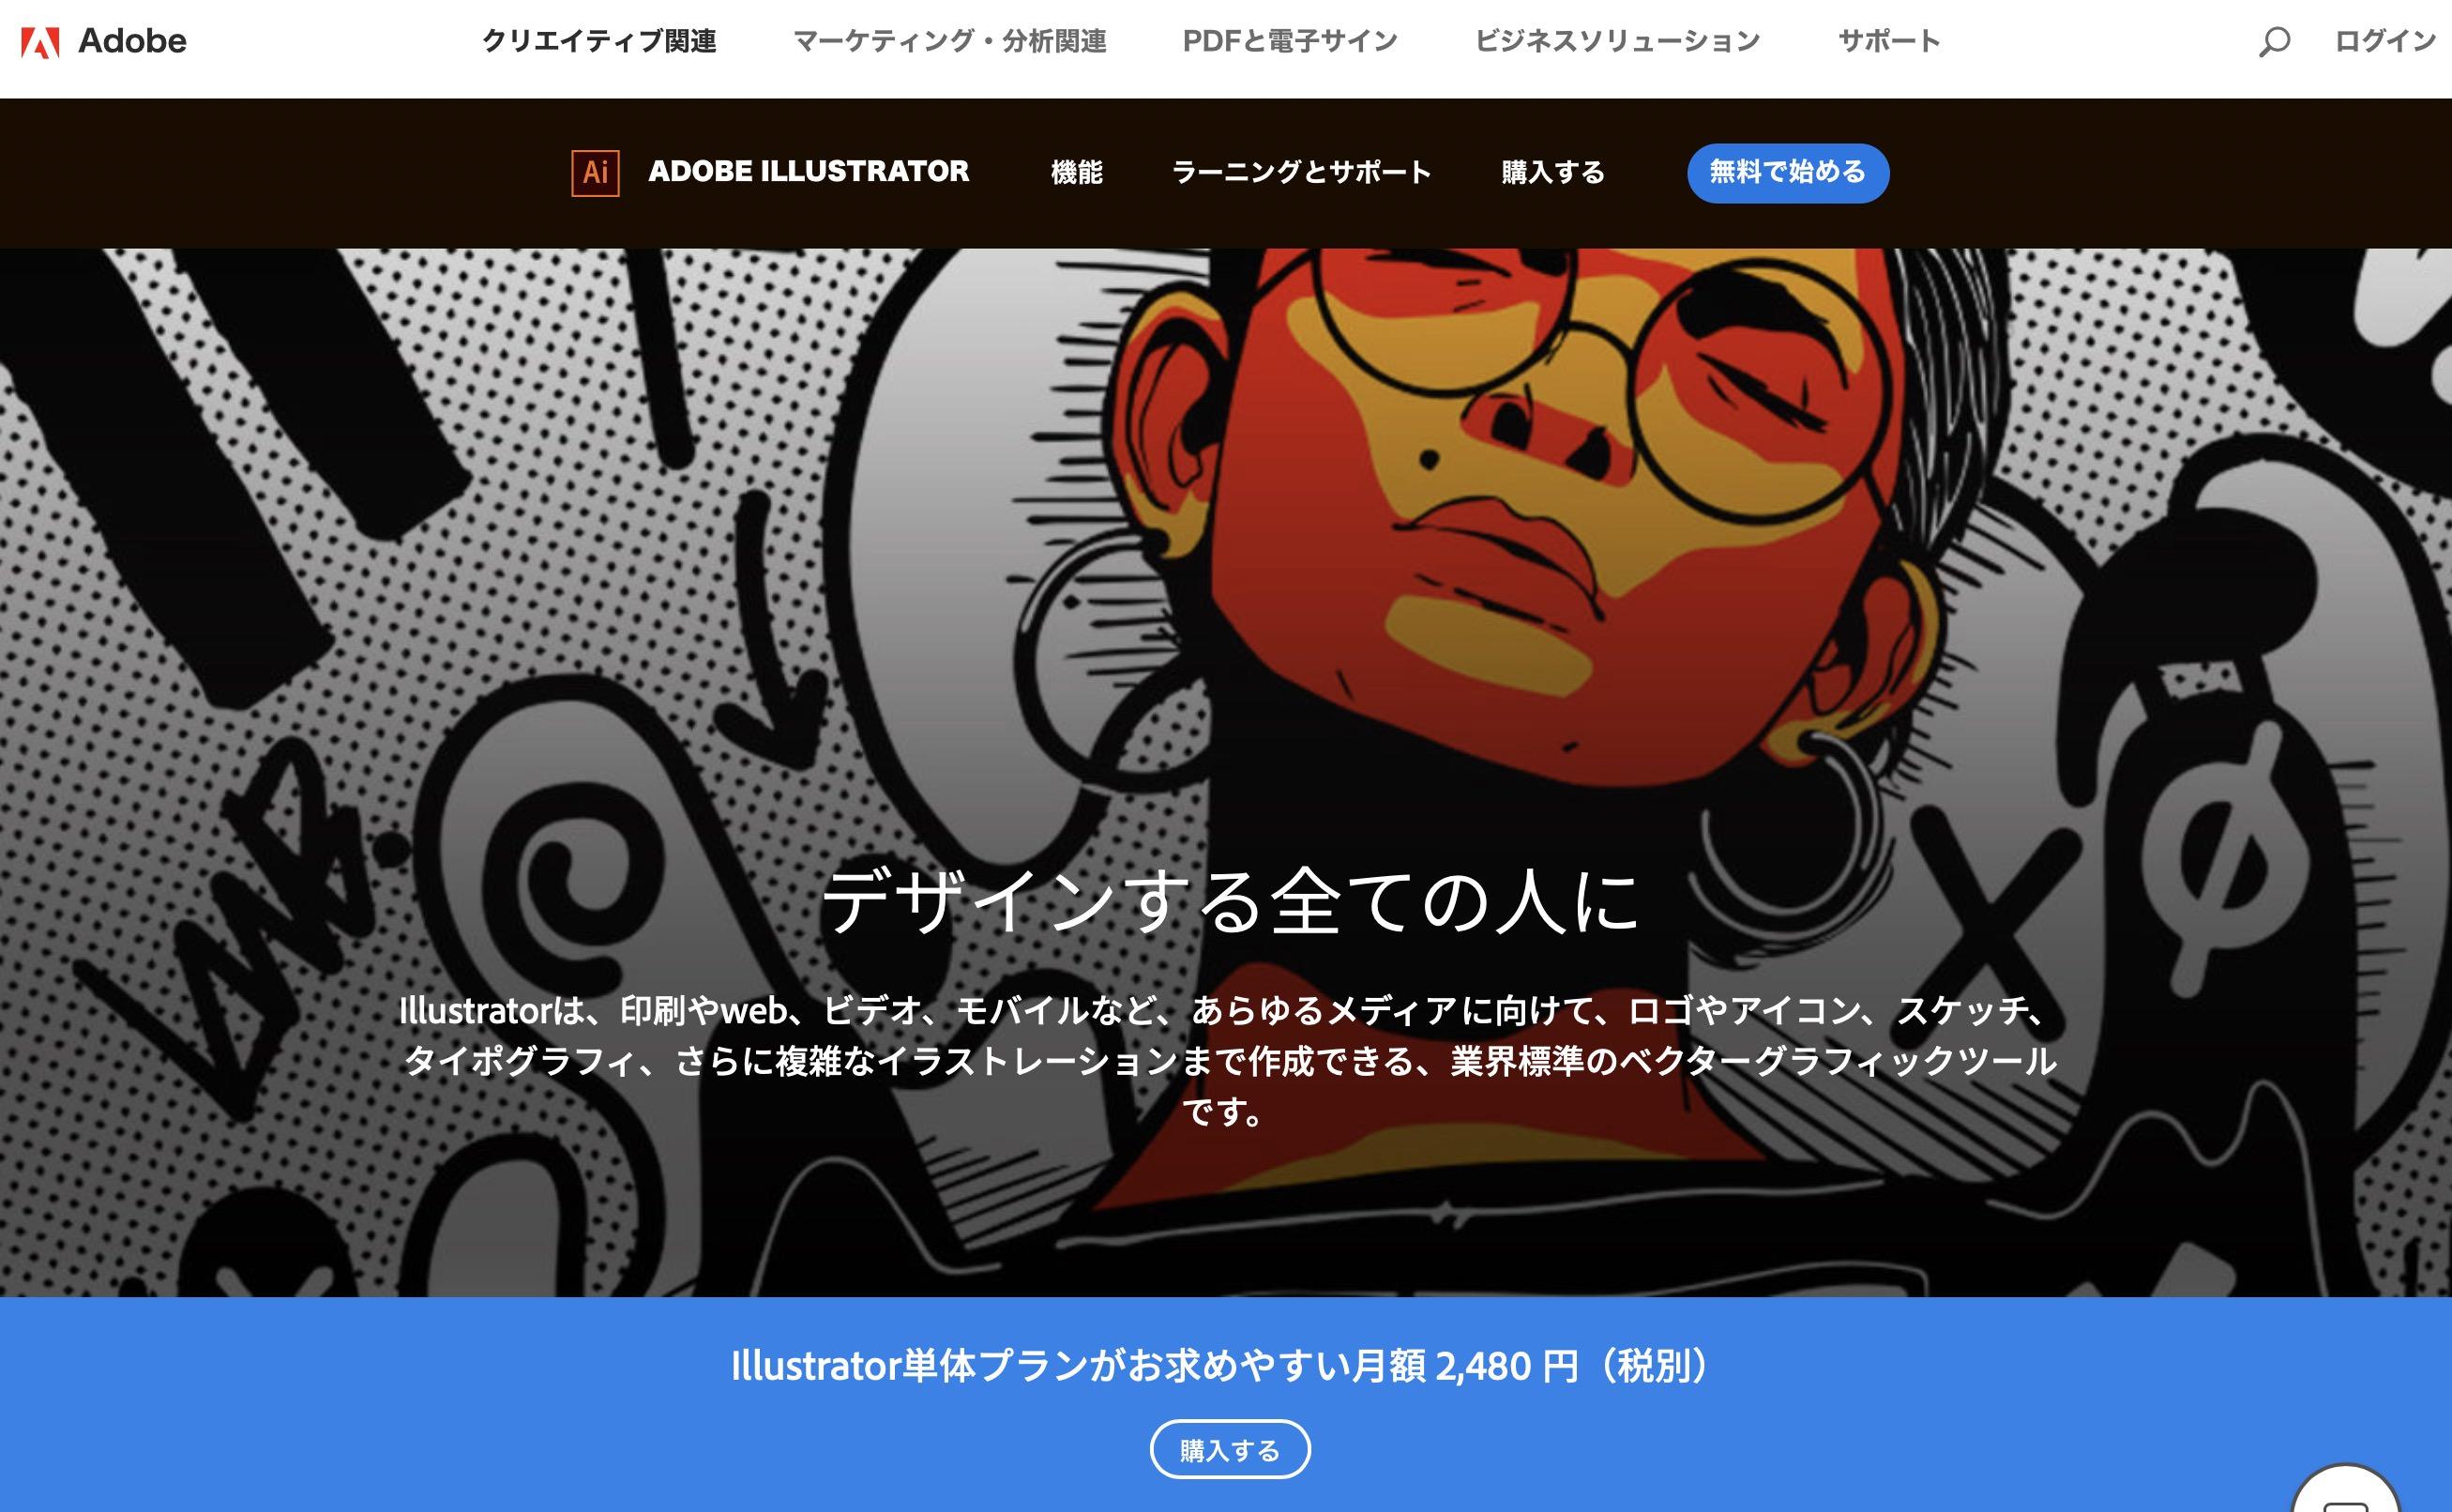 Illustrator 公式サイトキャプチャ